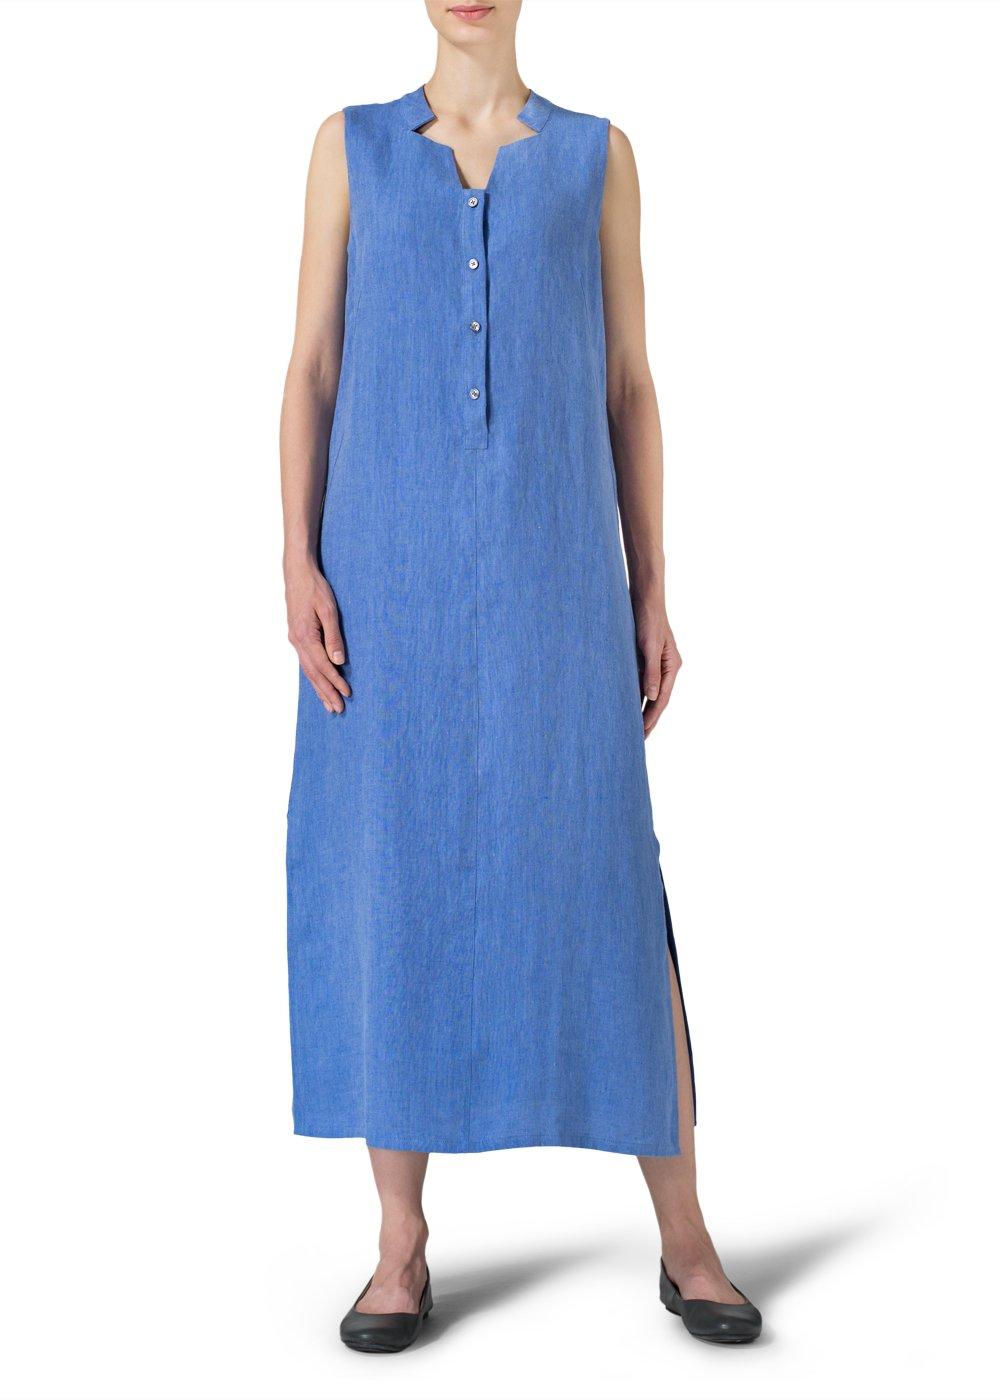 Vivid Linen Sleeveless Slip on Dress-3X-Sky Blue